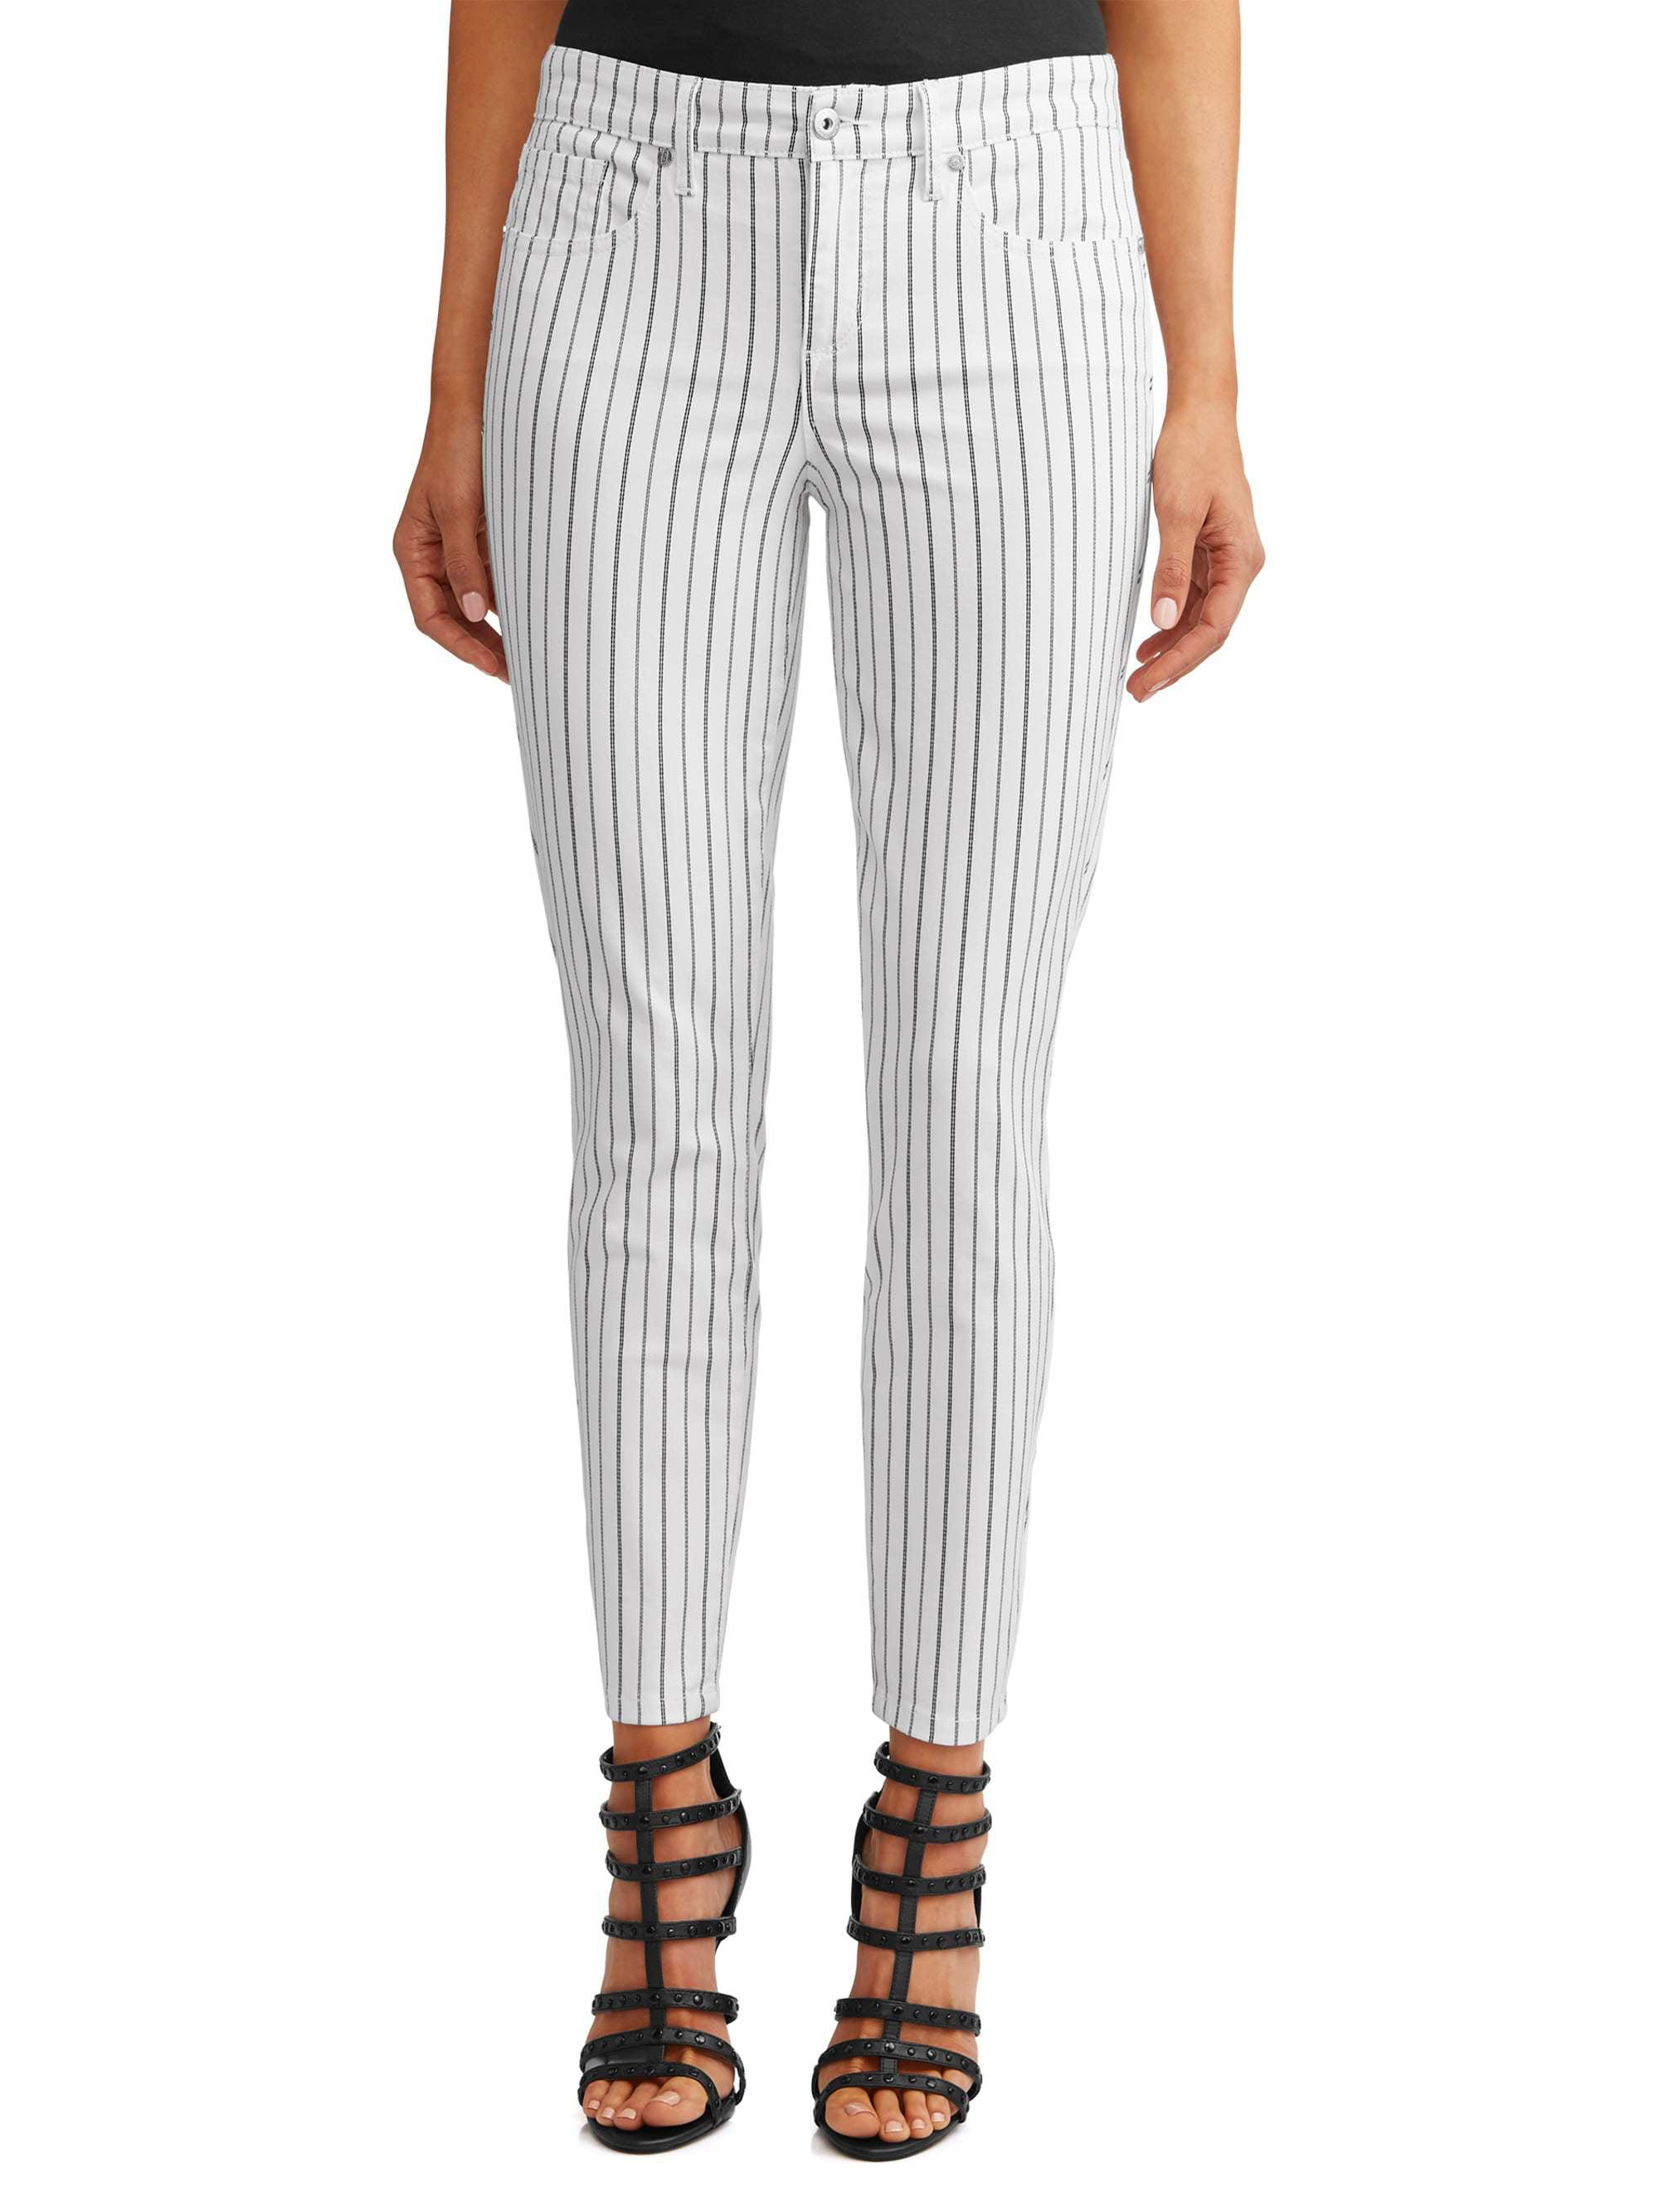 Sofía Skinny Pinstripe Mid Rise Ankle Jean Women's (White/Black)